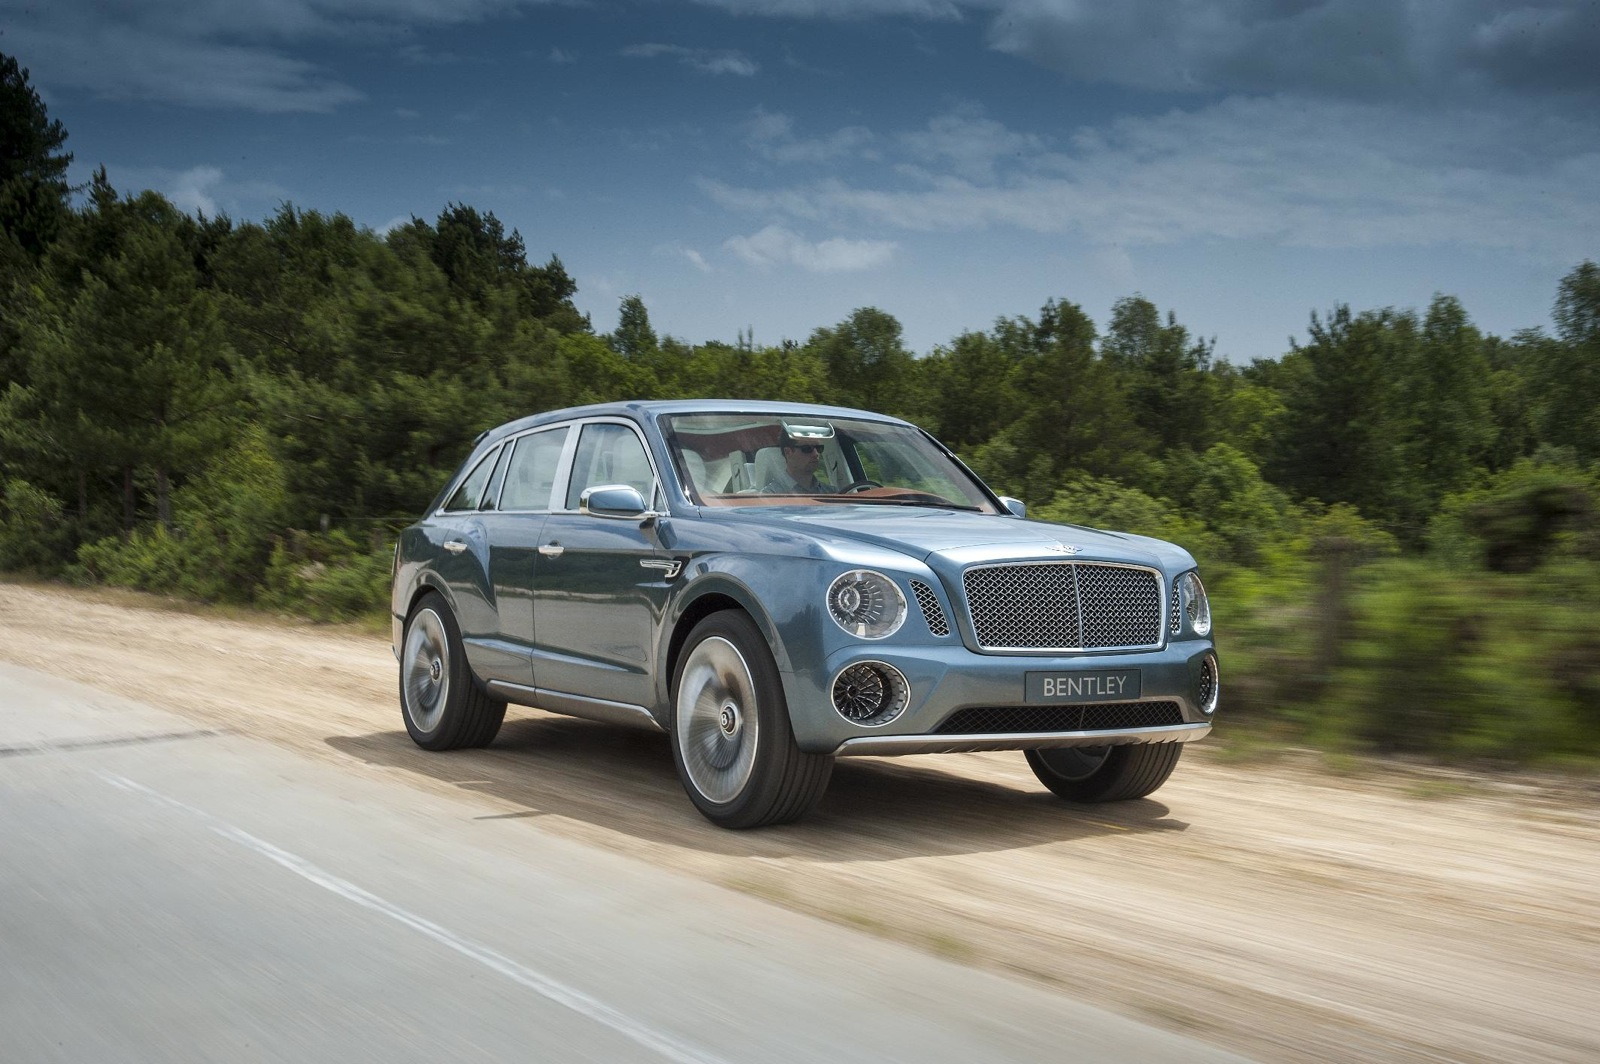 Bentley suv third row plug in hybrid w 12 engine part of plan vanachro Image collections